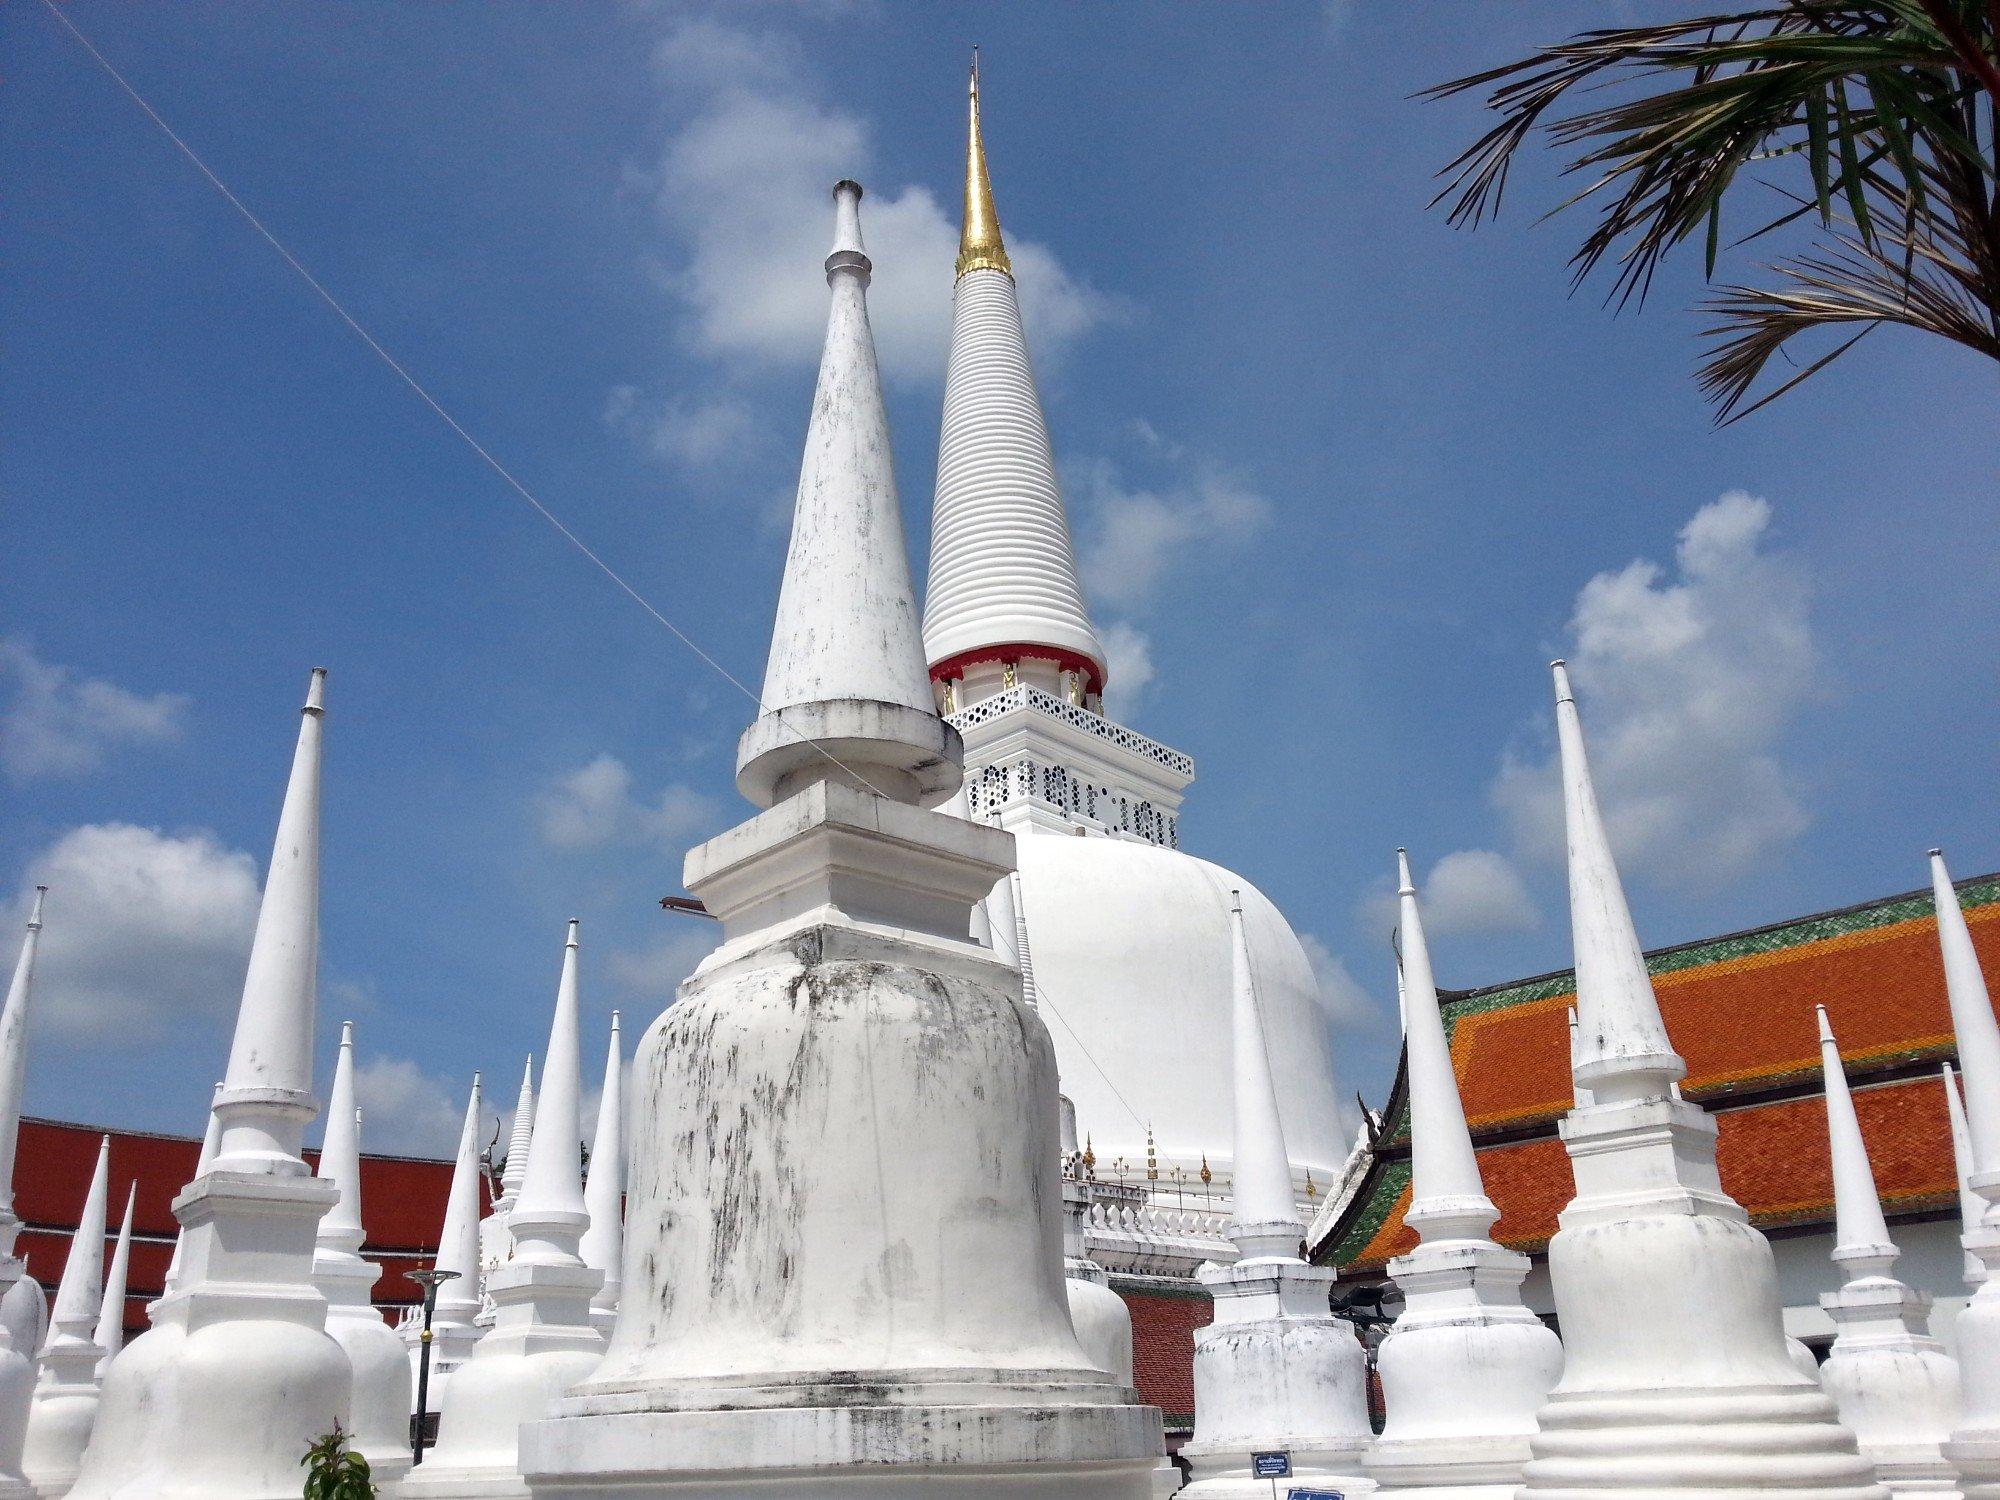 Wat Phra Mahathat in Nakhon Si Thammarat